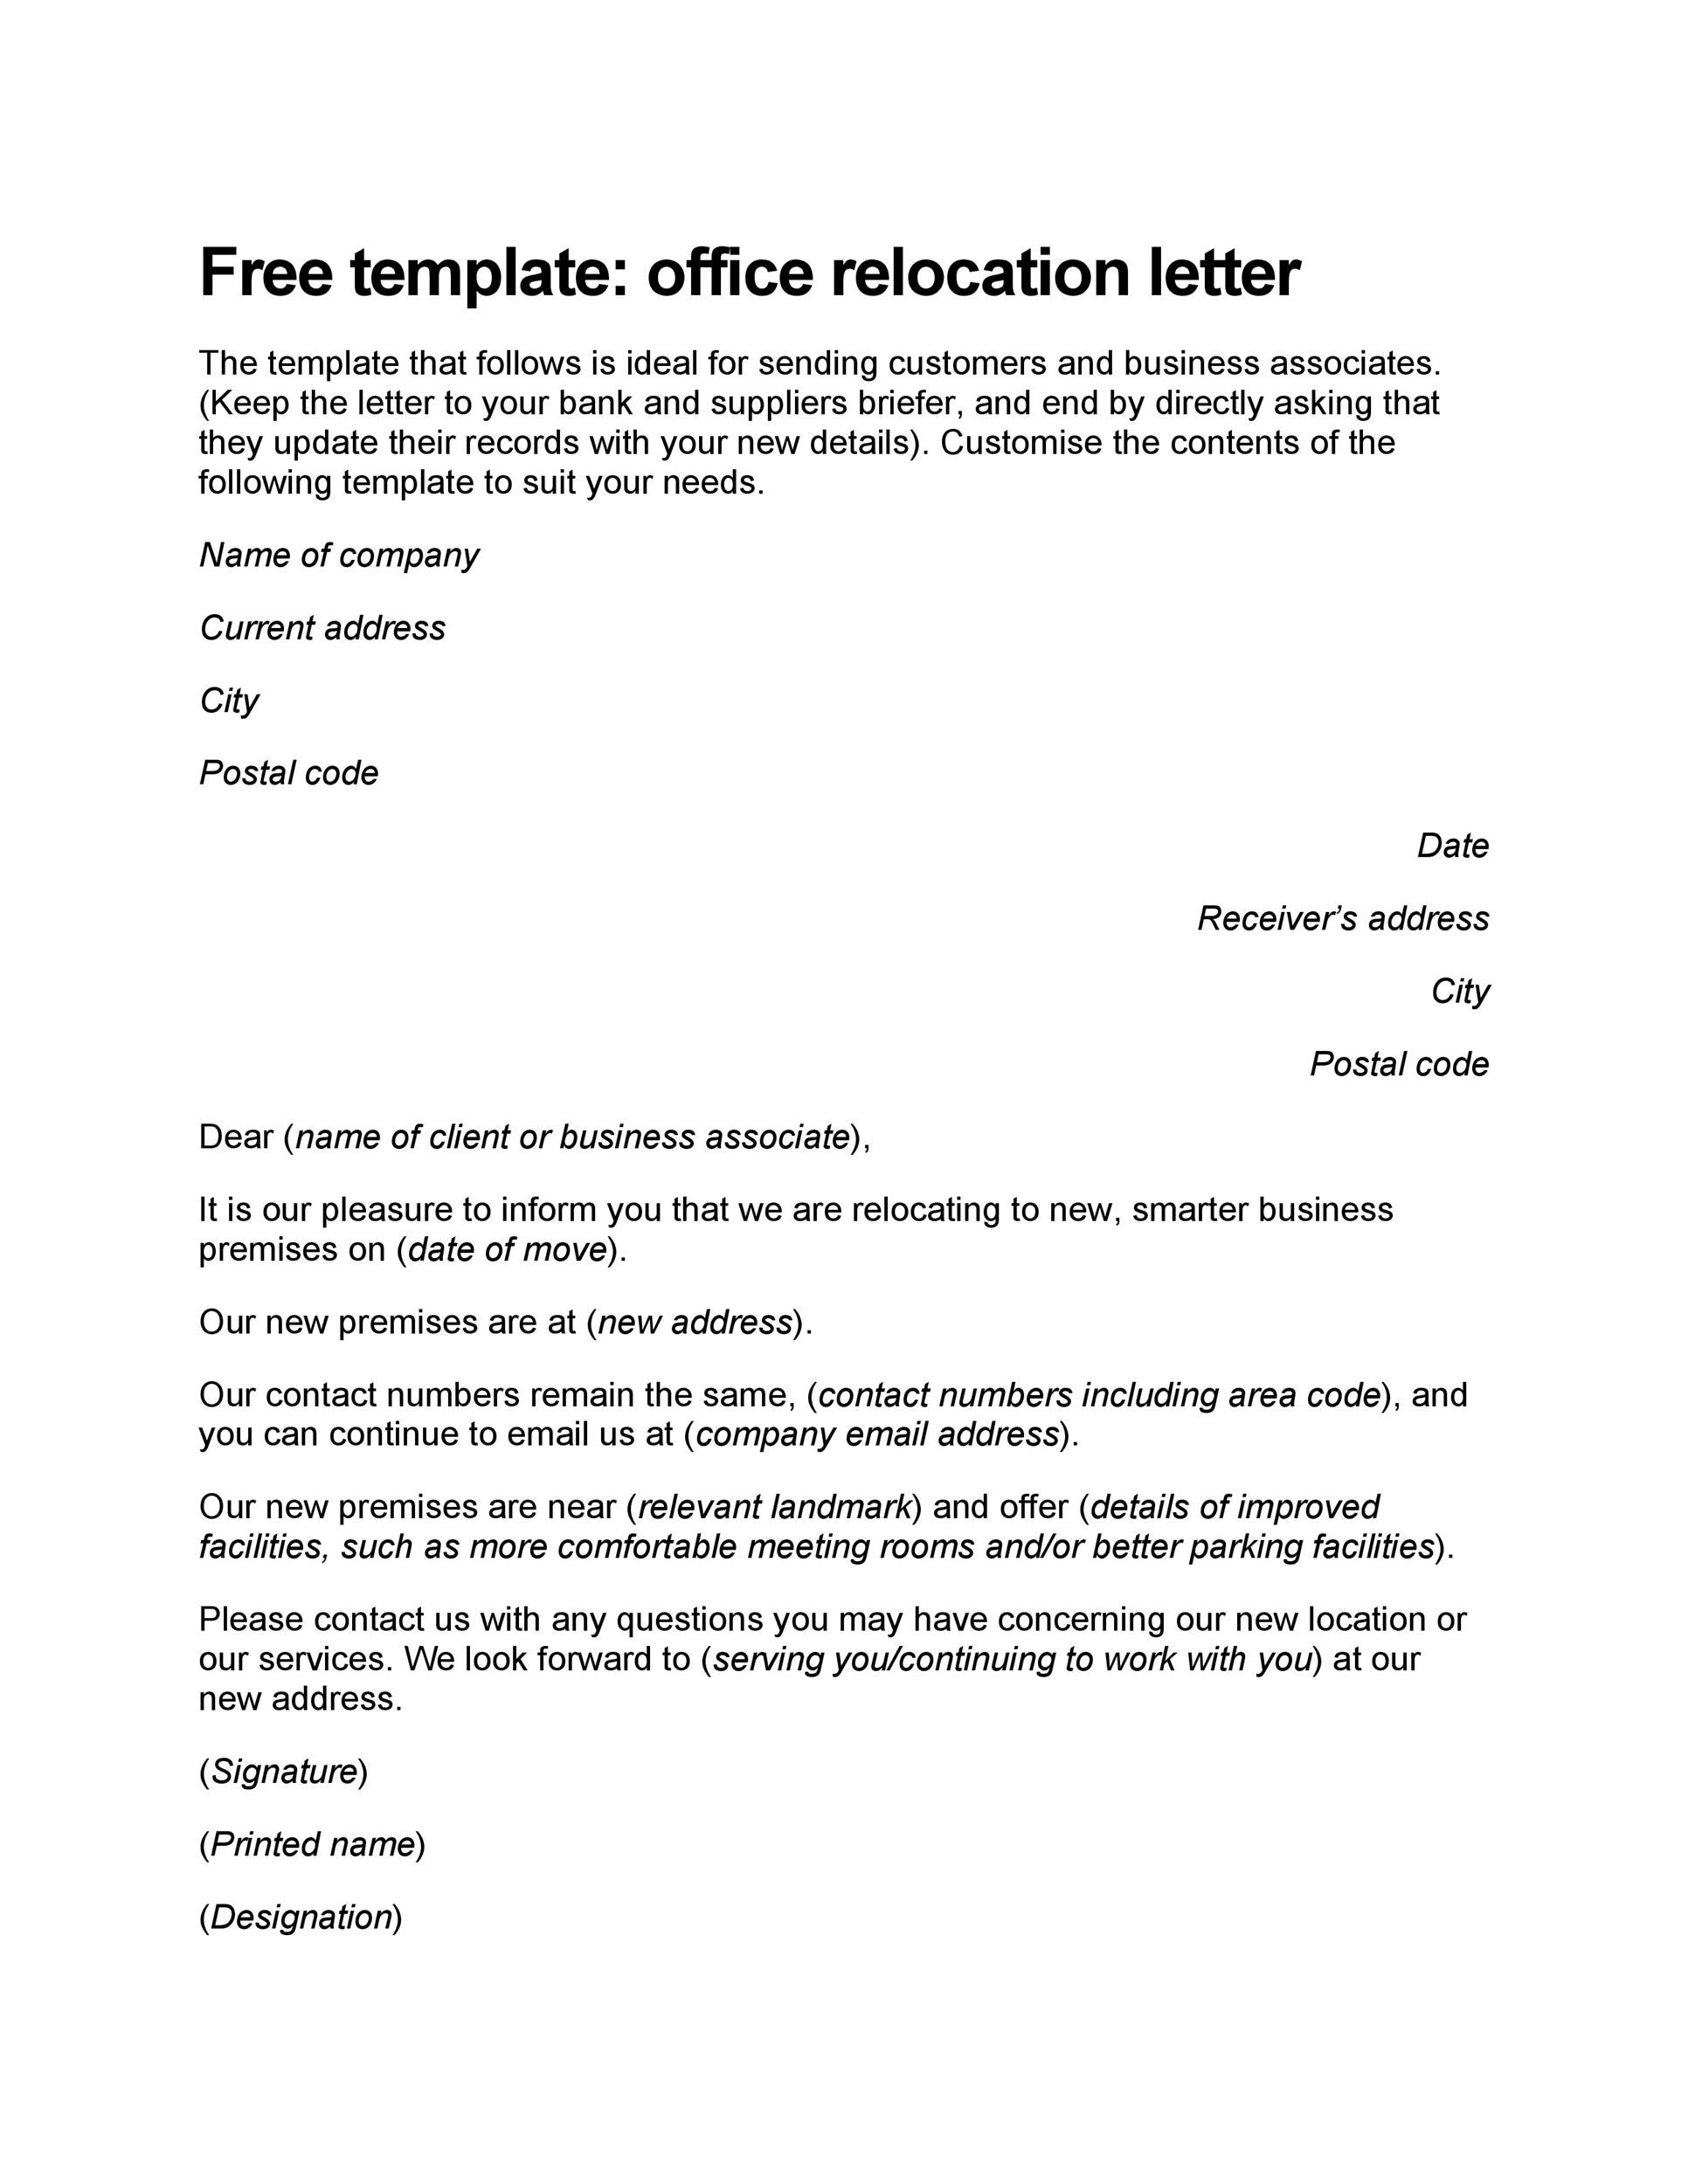 Free change of address letter 28